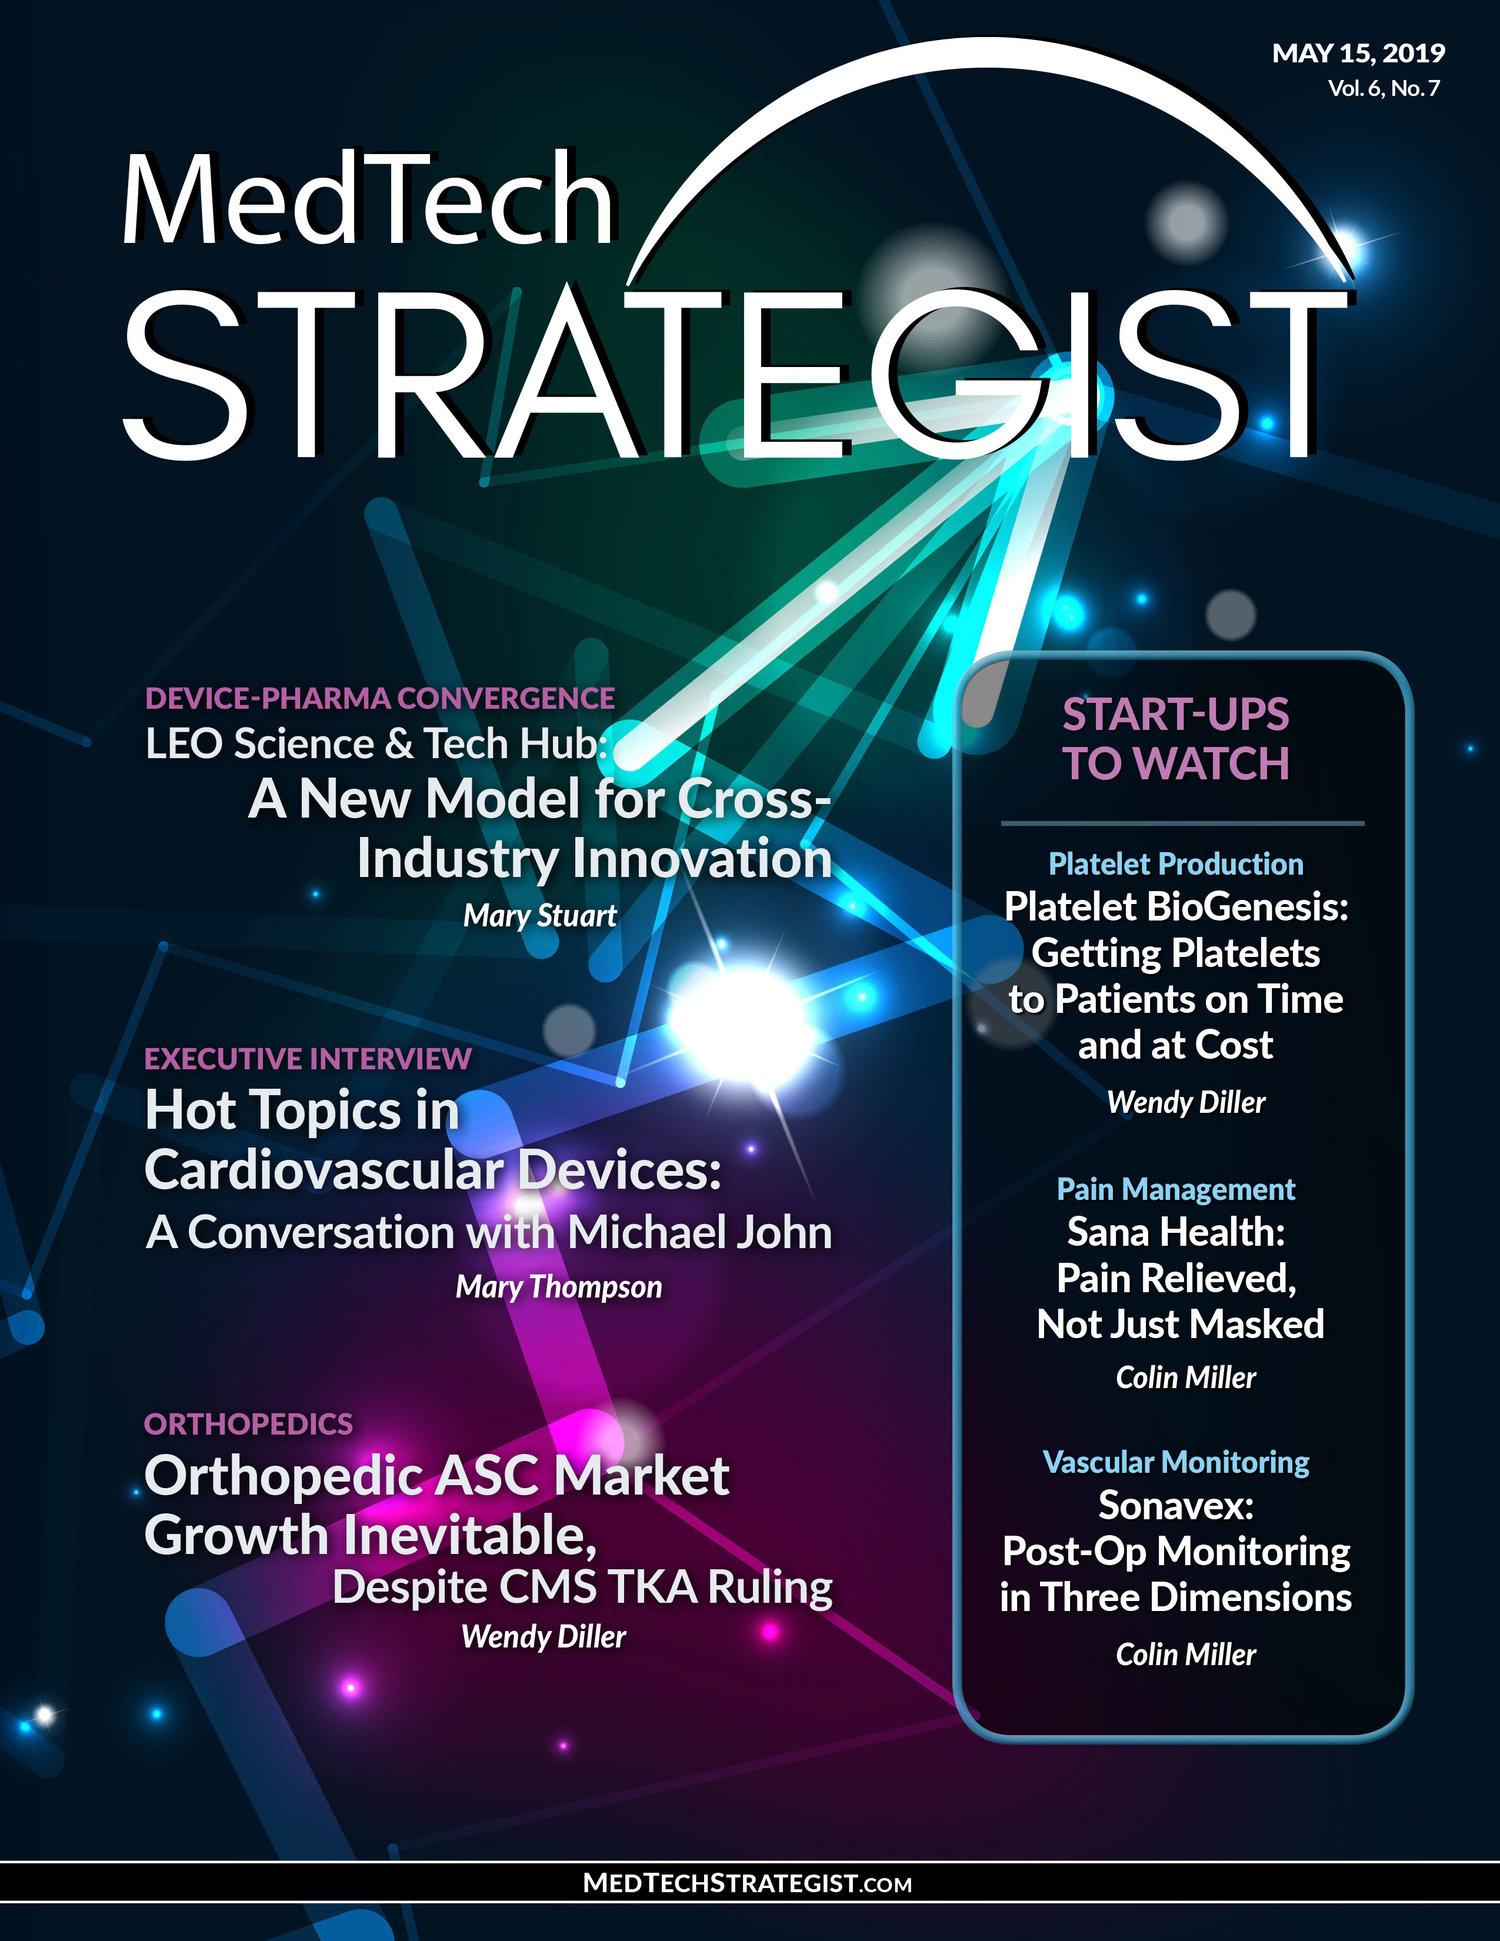 Issue - May 15, 2019 — MedTech Strategist